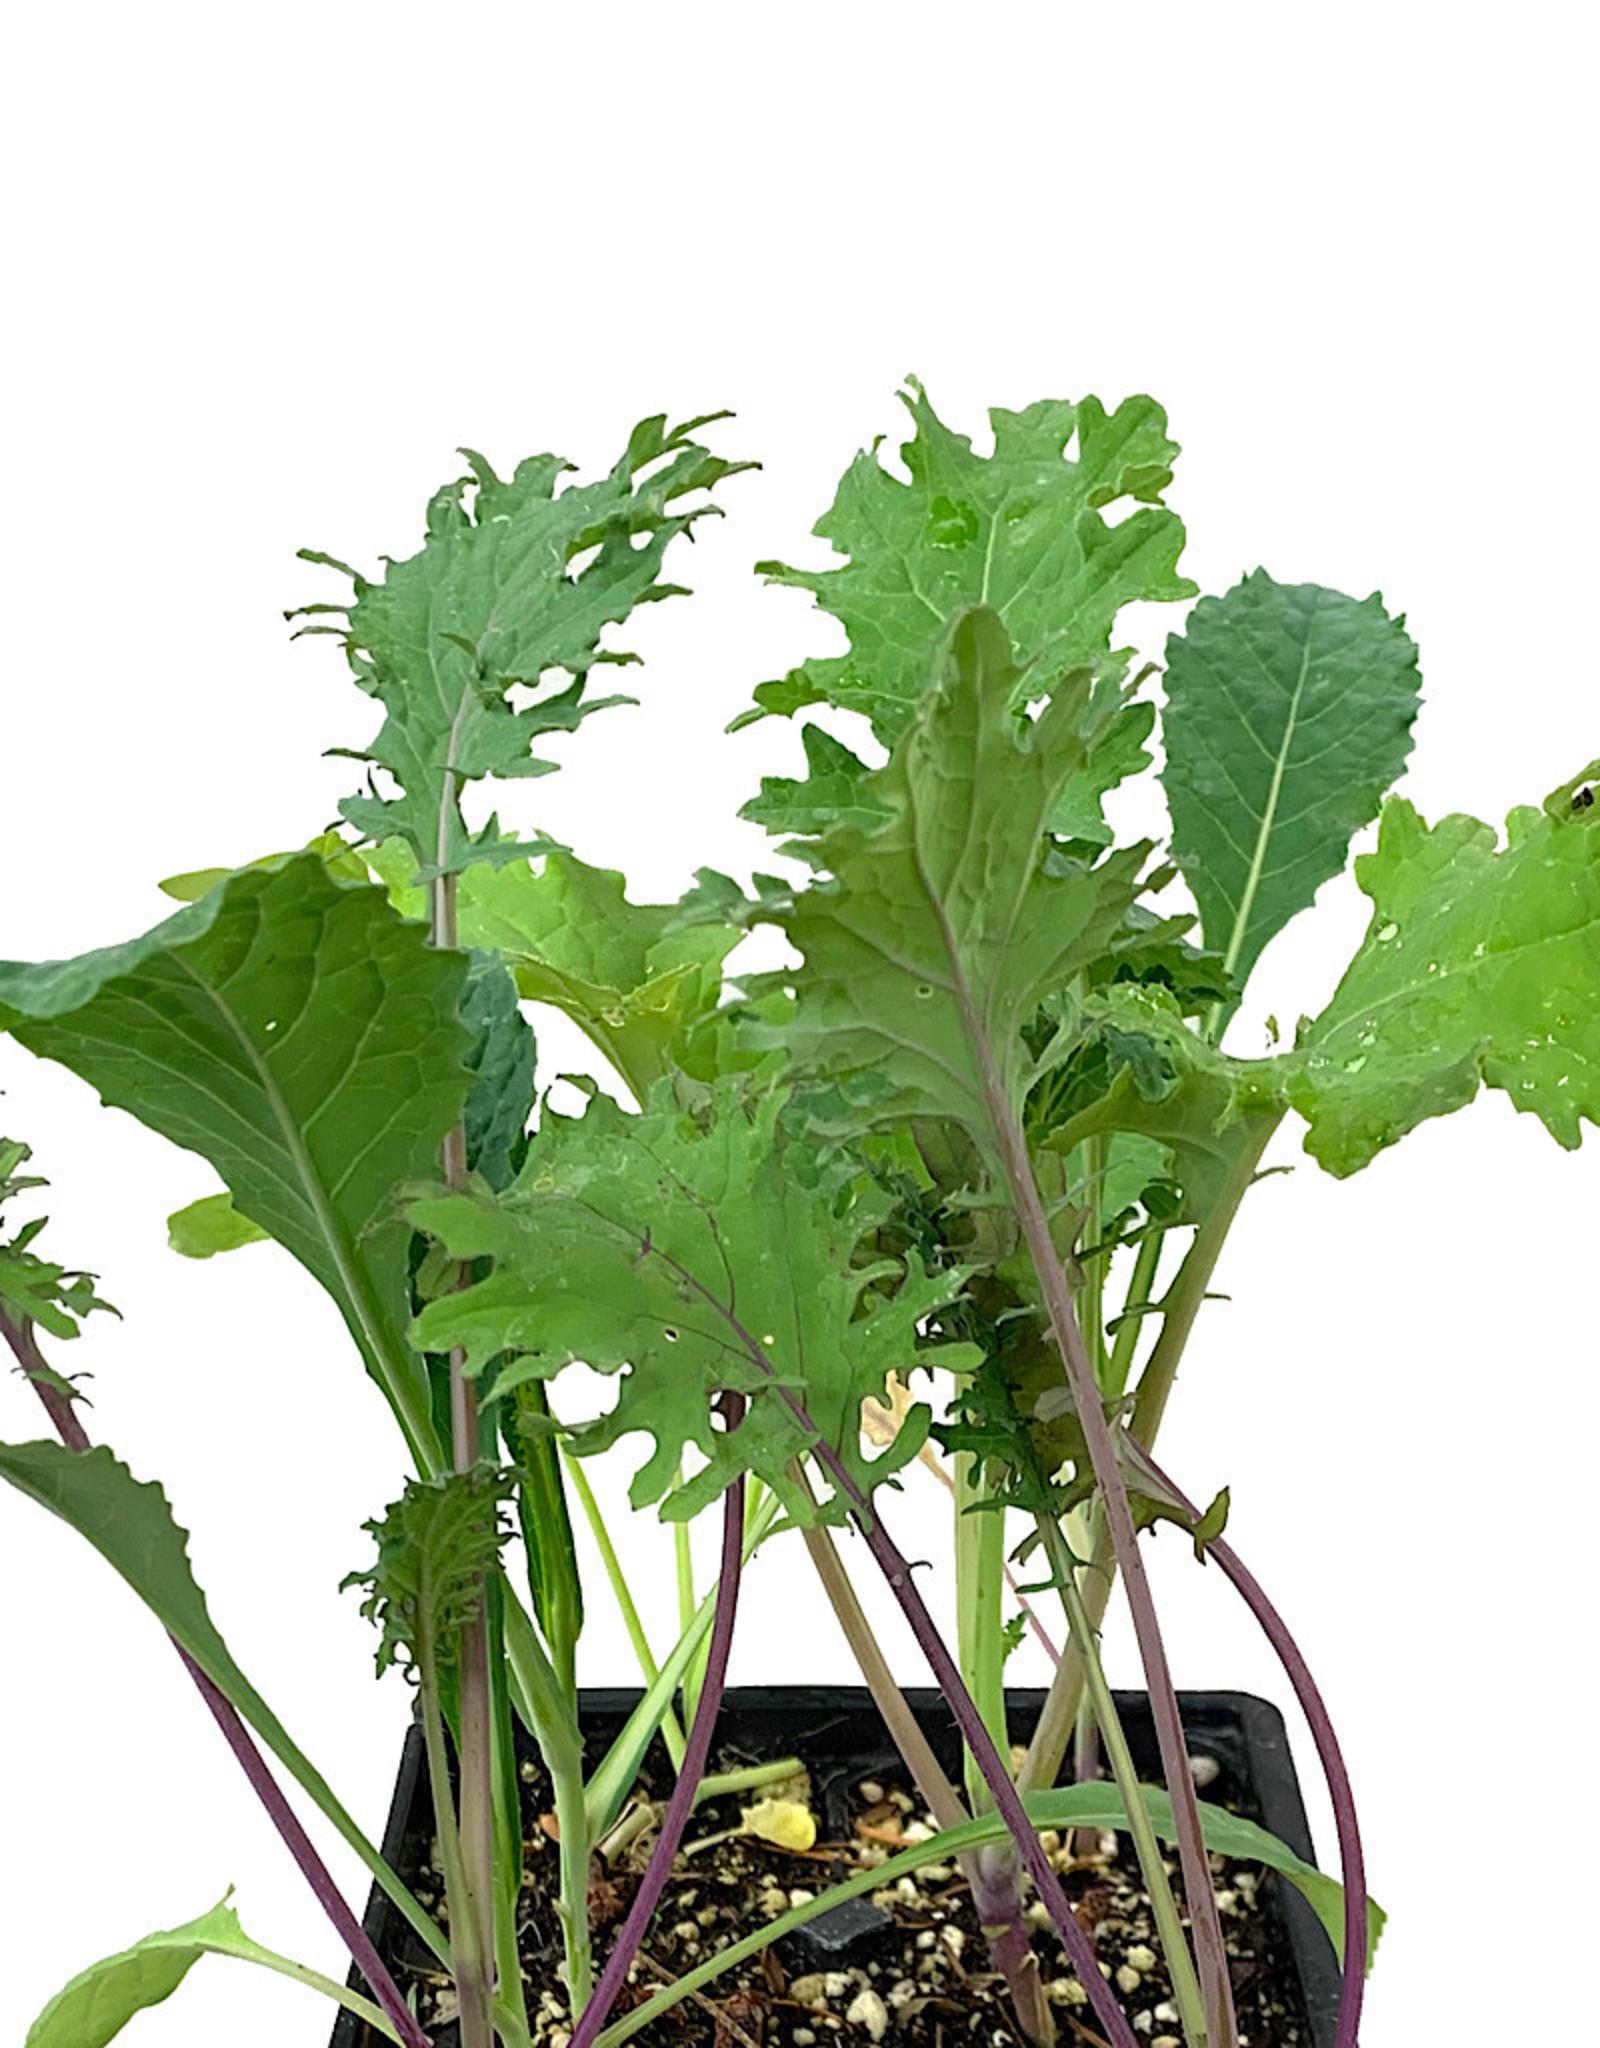 Kale 'Gourmet Mix' Jumbo Traypack